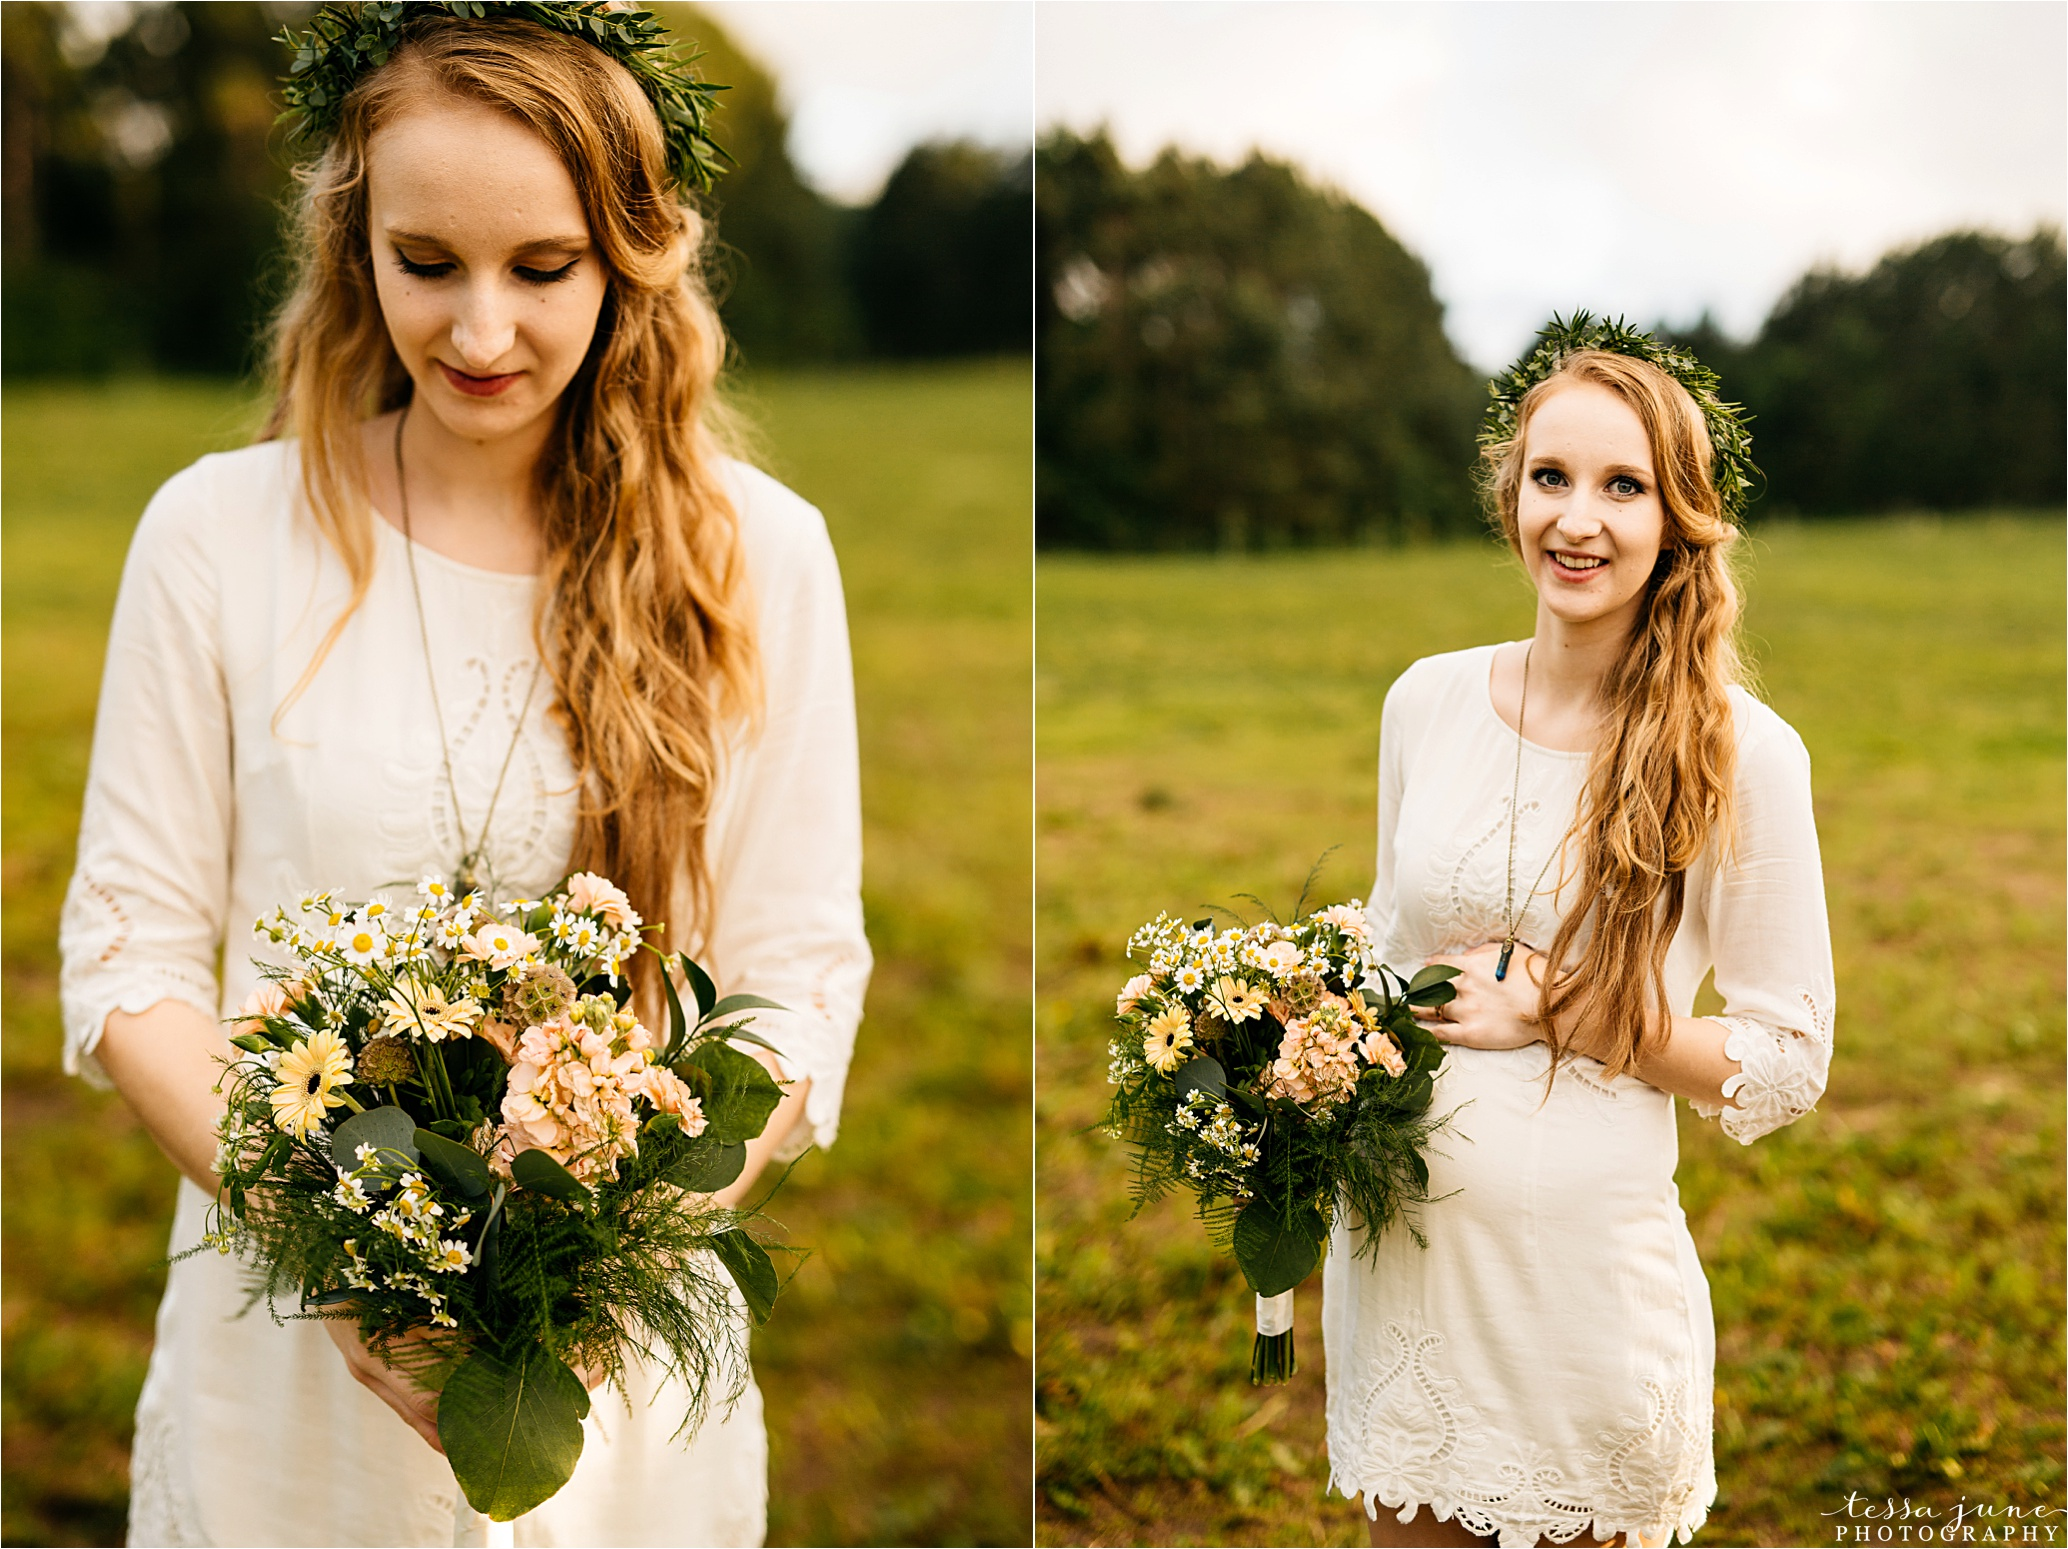 bohemian-forest-wedding-stillwater-minnesota-flower-crown-st-cloud-photographer-bridesmaid